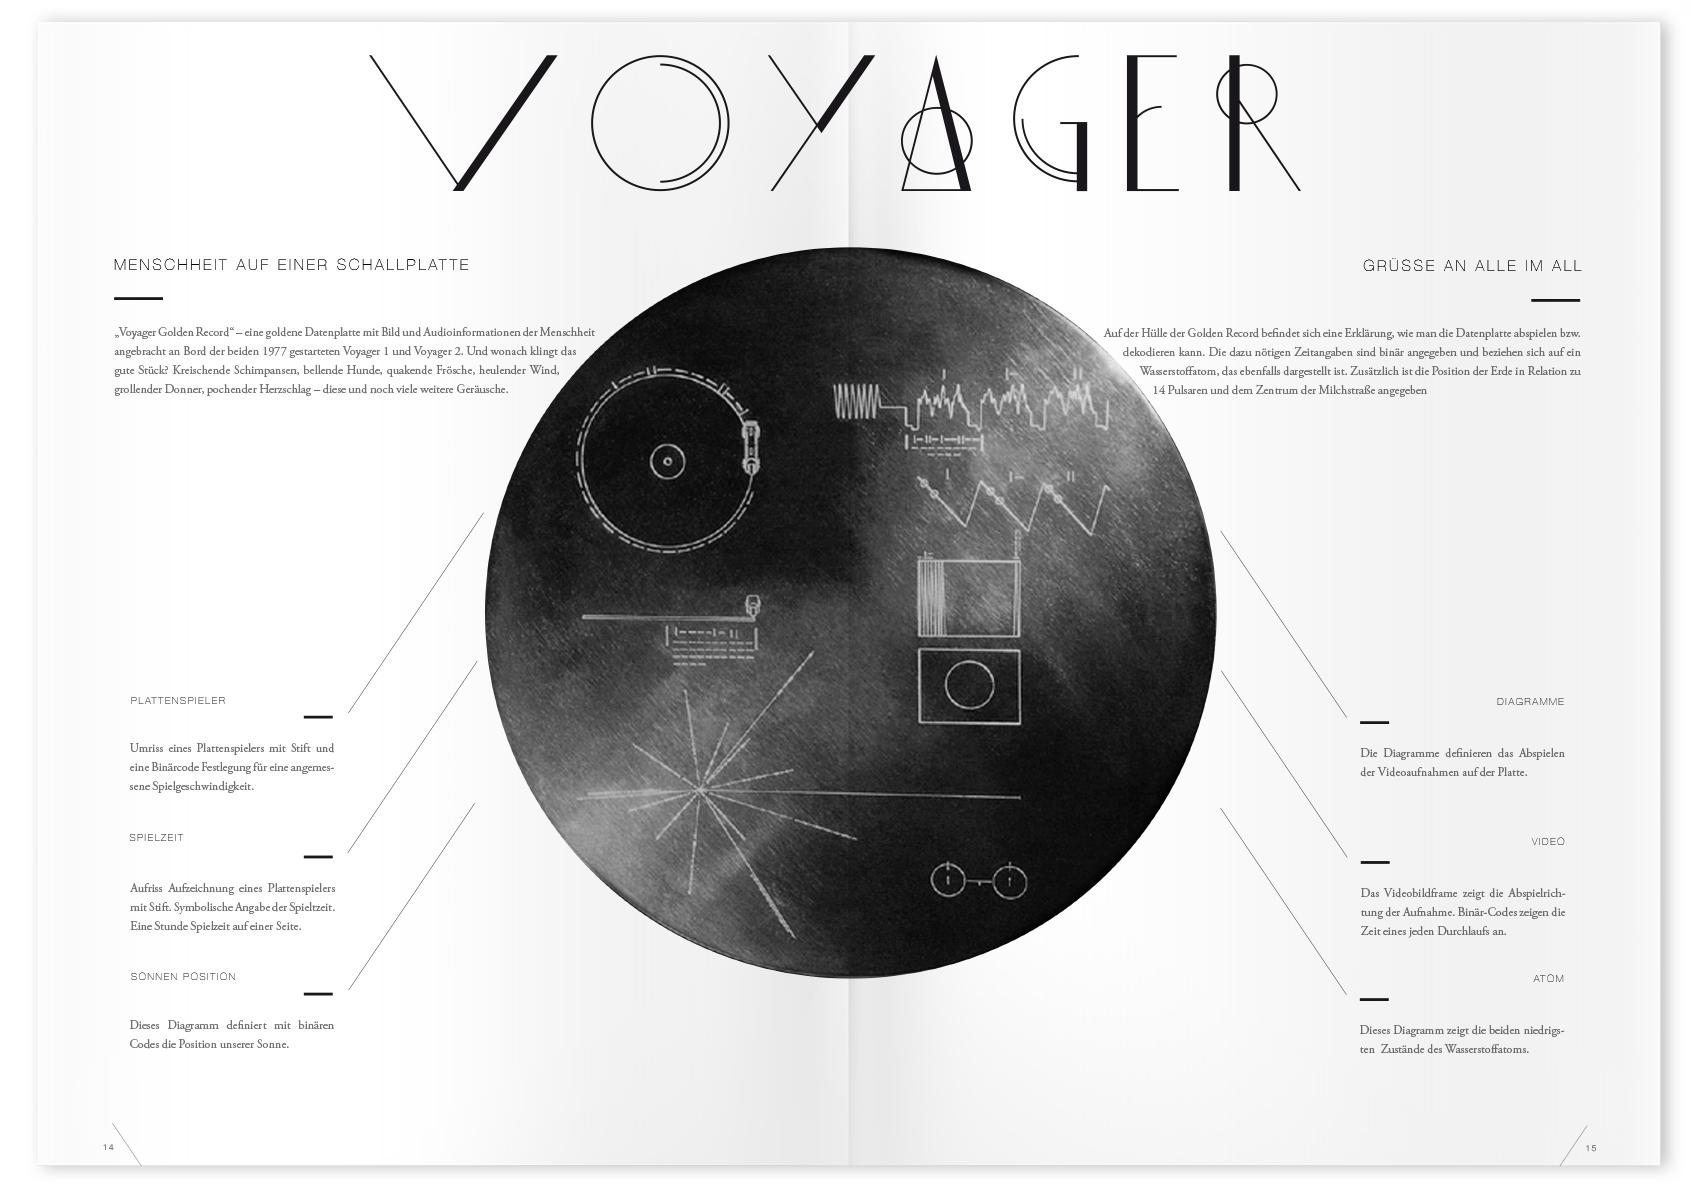 02_Cosmos-Magazin_hsrm-Hochschule-RheinMain_Editorial-Design_Grafikdesign_Gloria-Kison.jpg